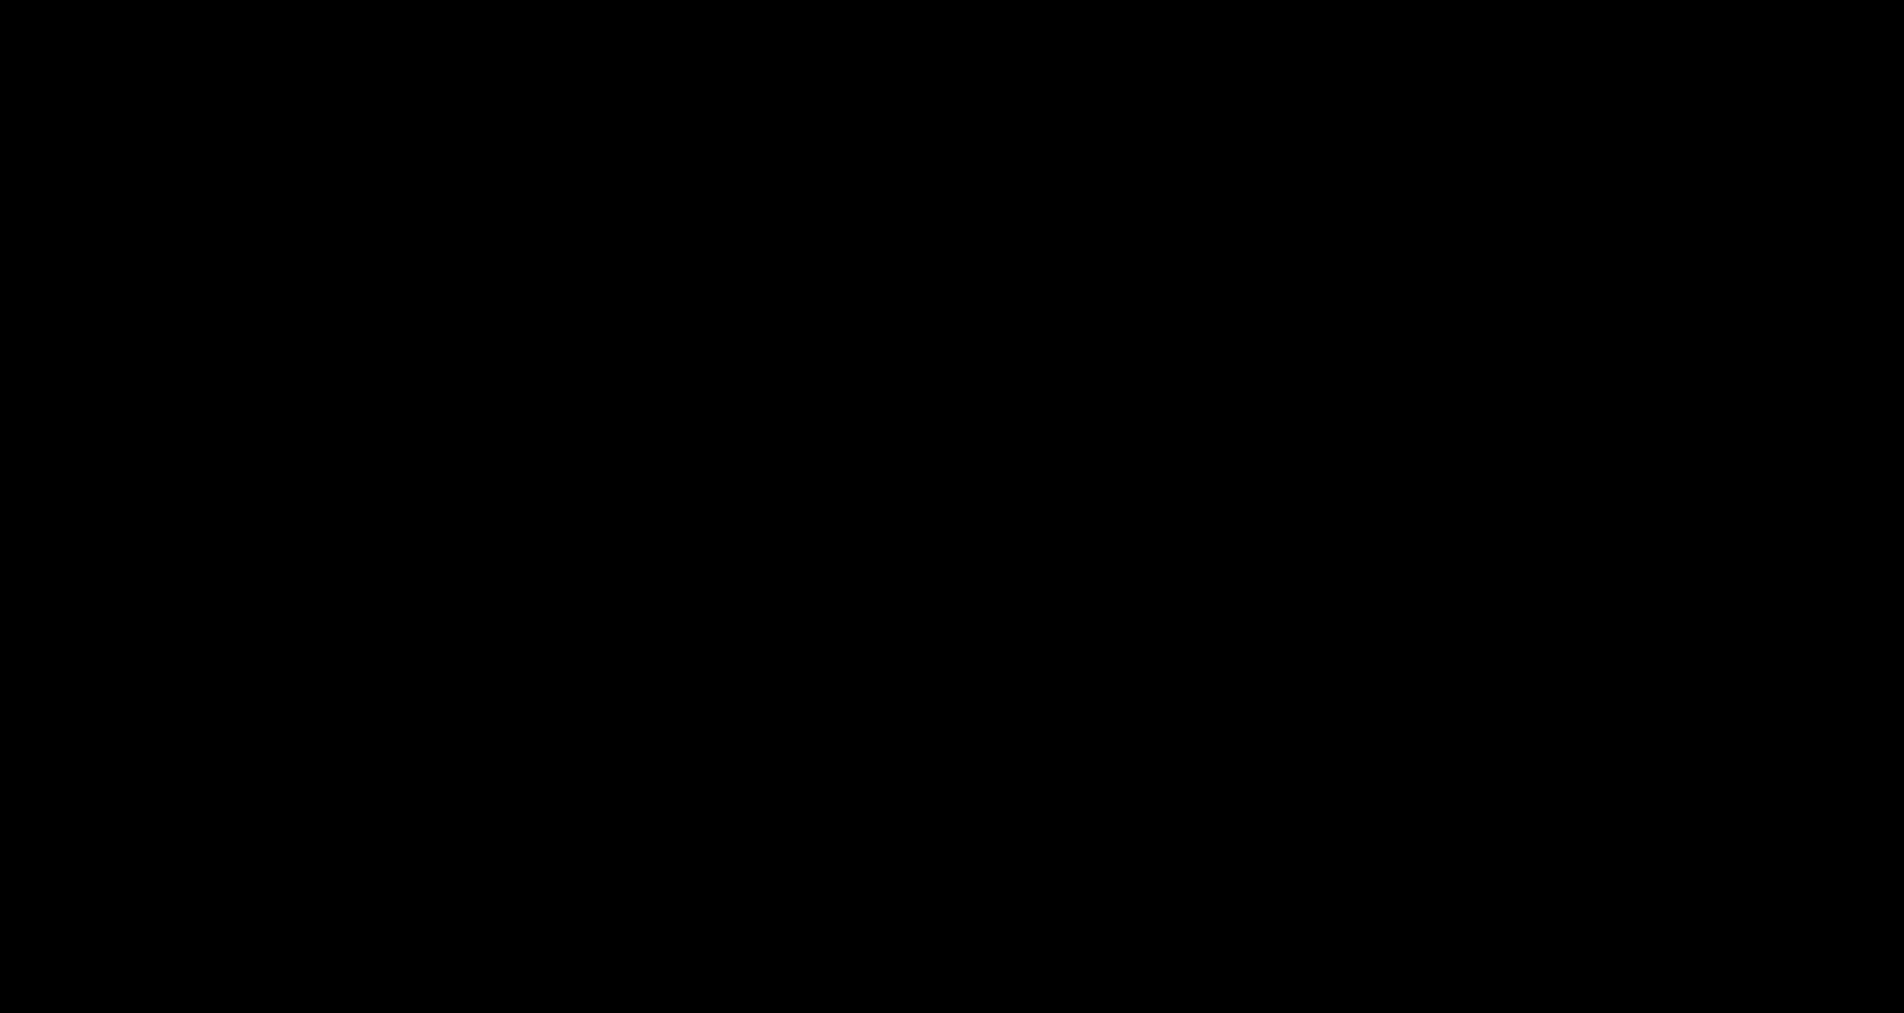 frågetecken-illustration-maja-larsson